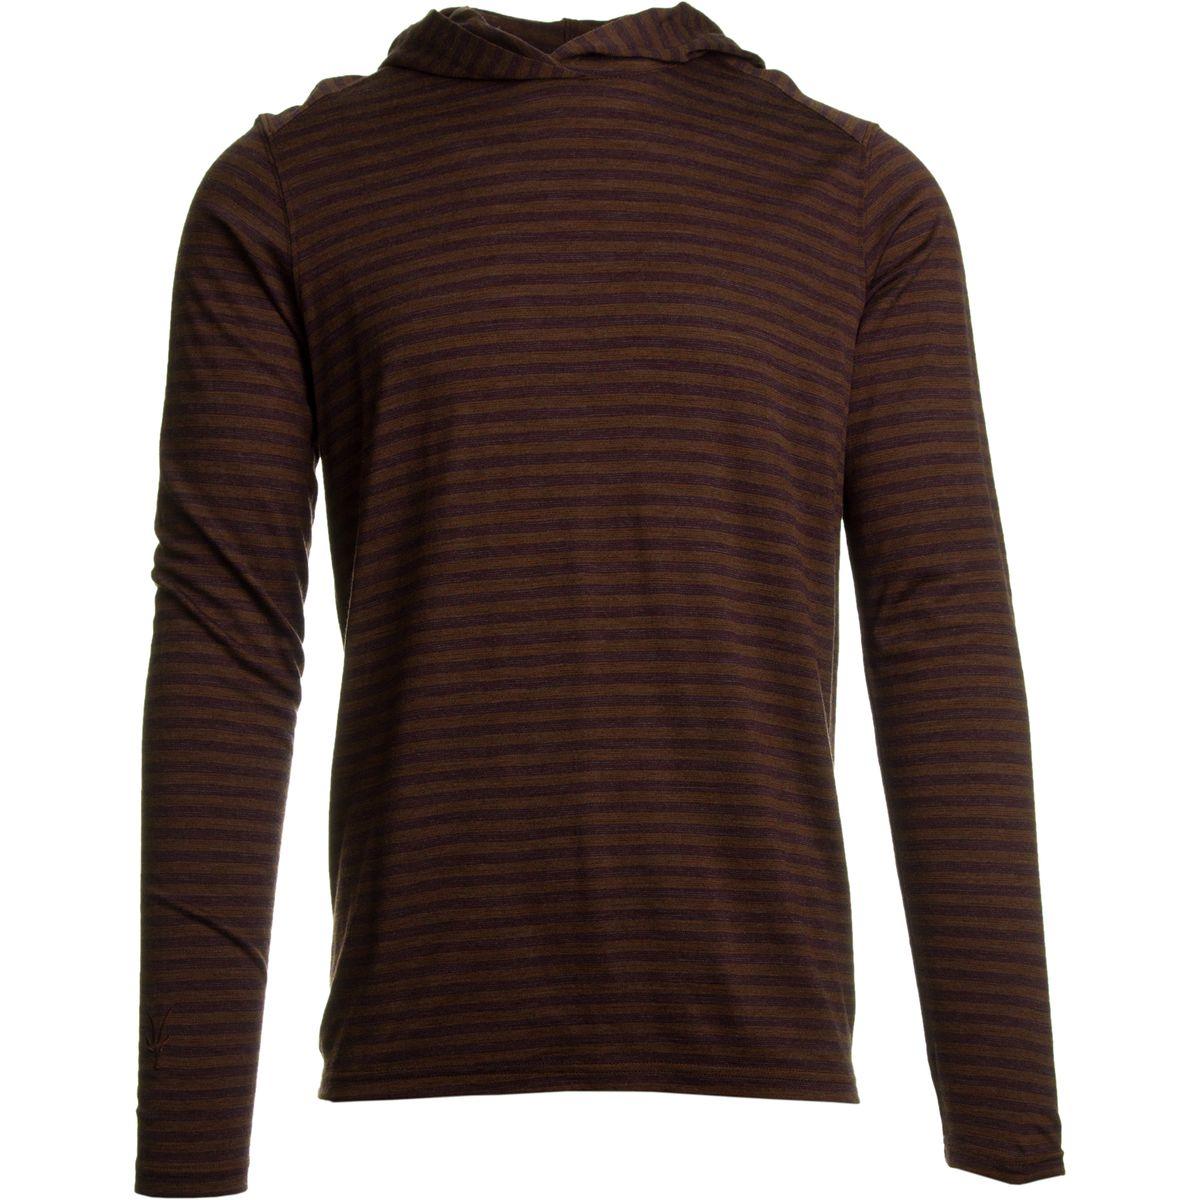 Ibex Straightaway Hooded Sweater - Men